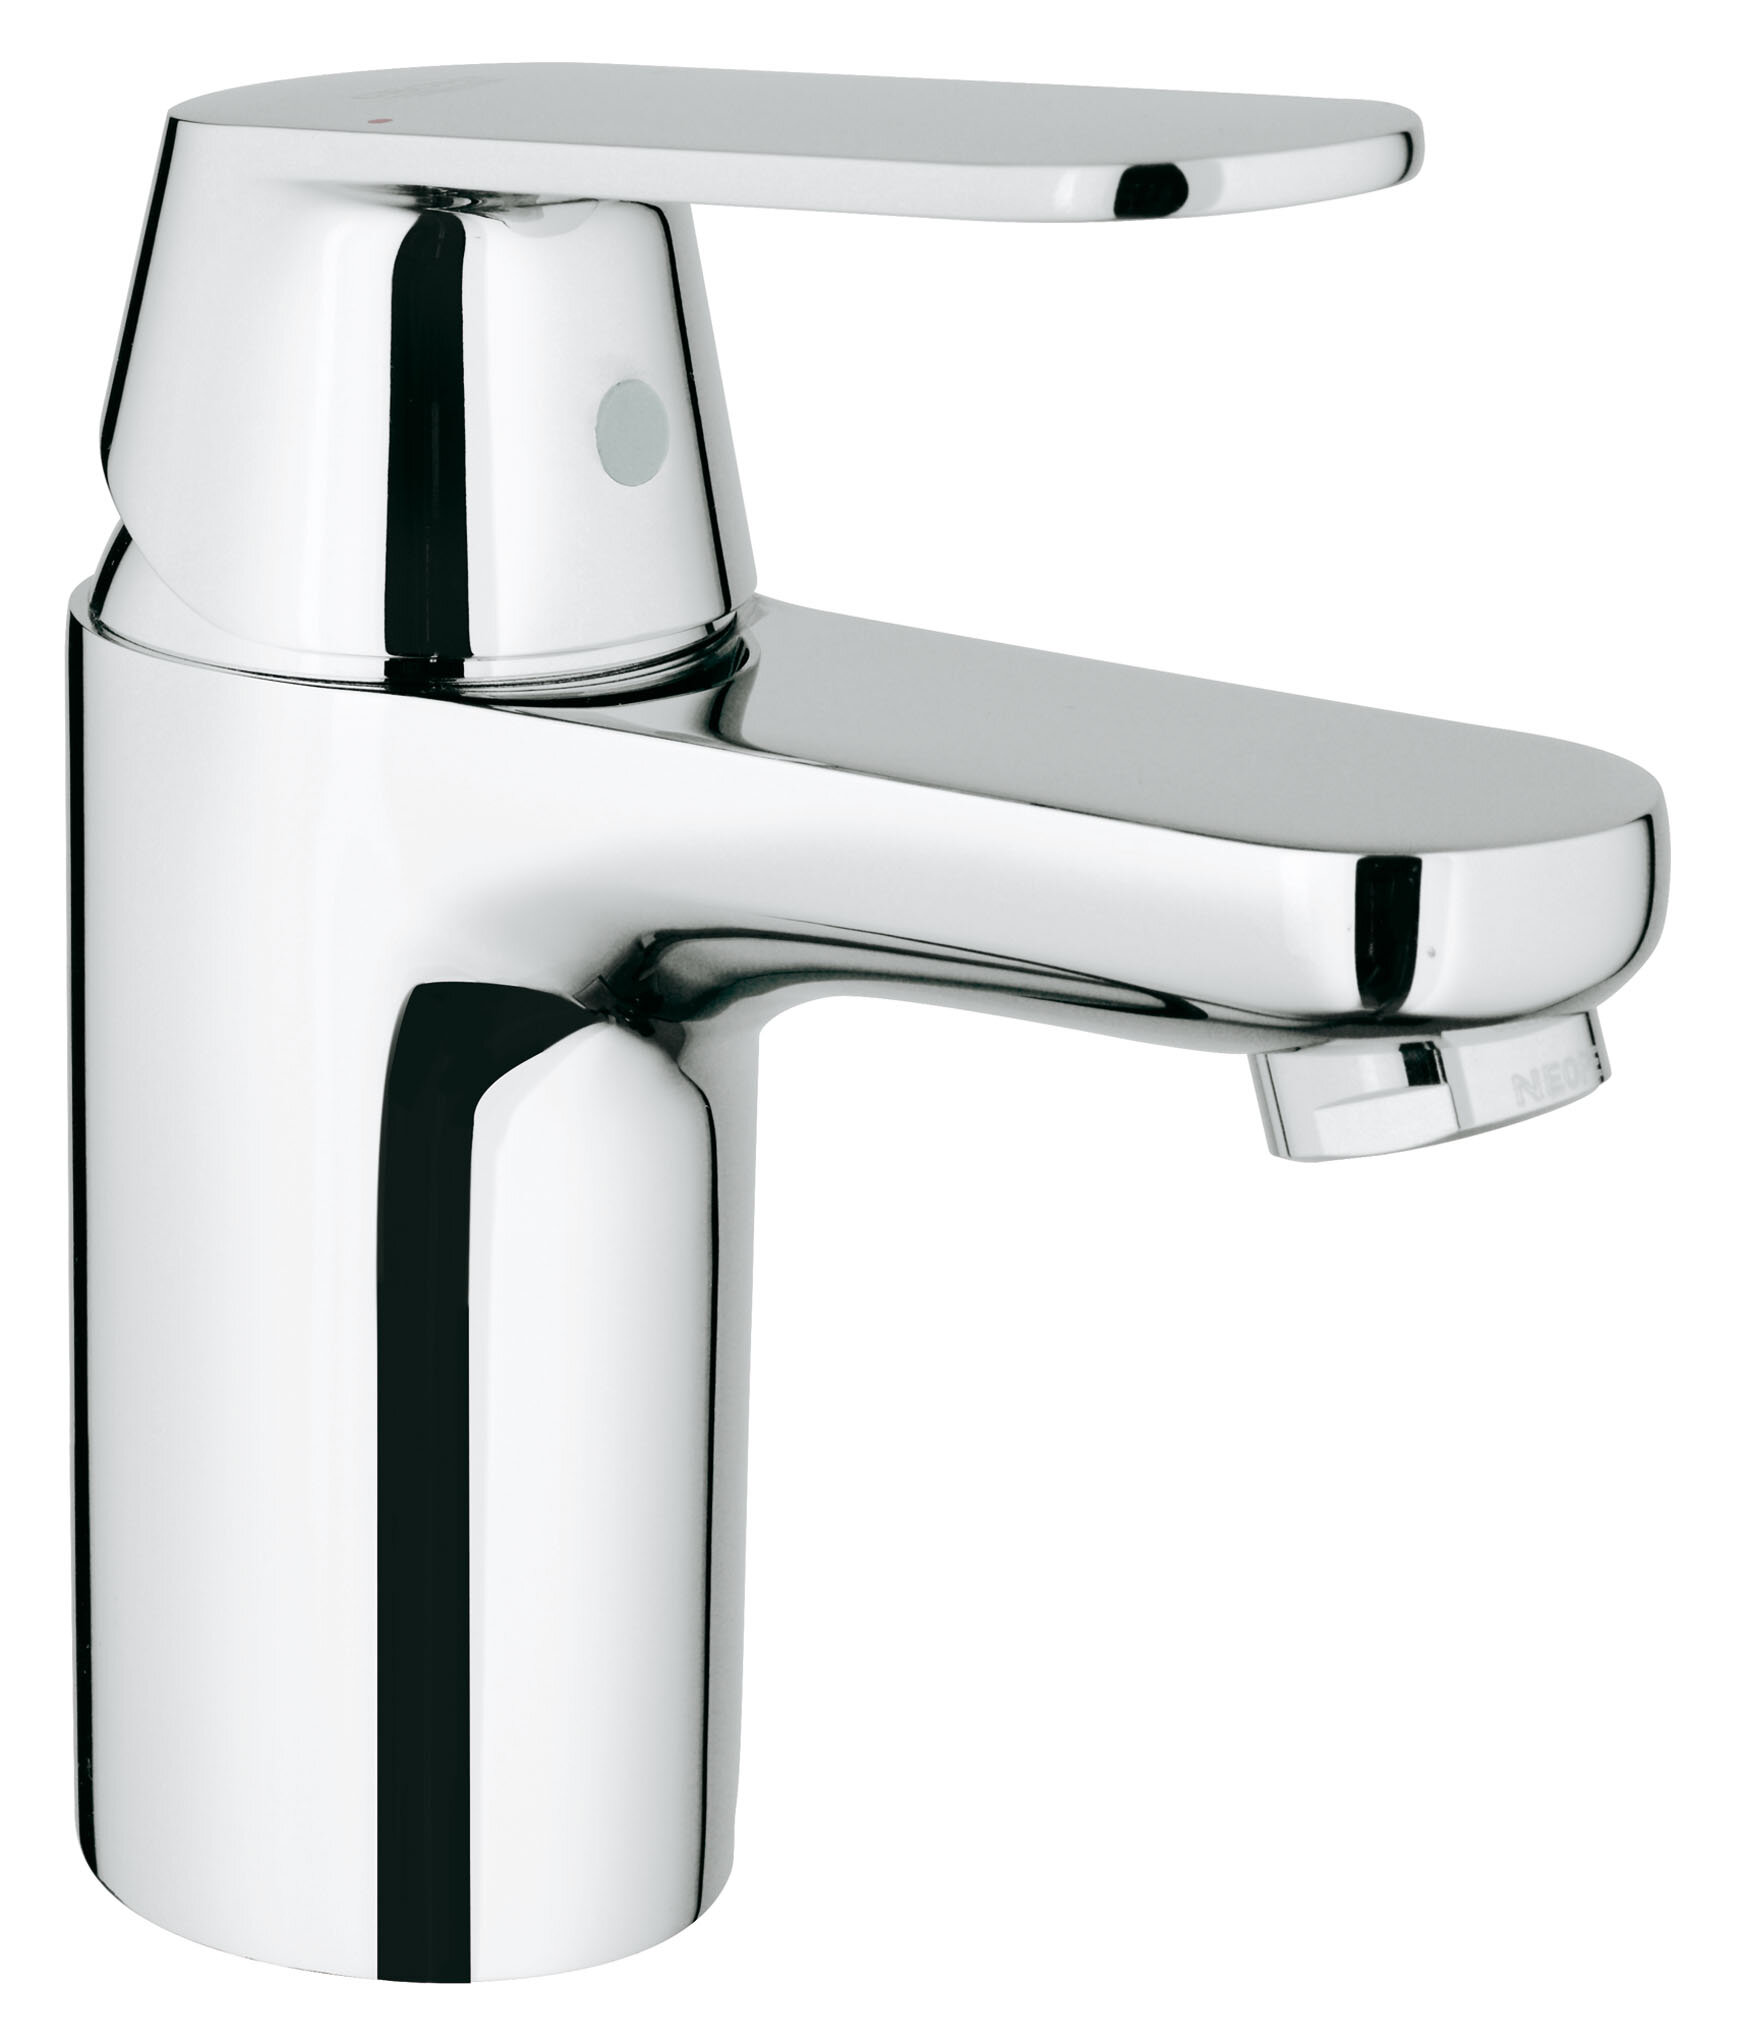 Grohe Eurosmart Single Hole Bathroom Faucet & Reviews | Wayfair